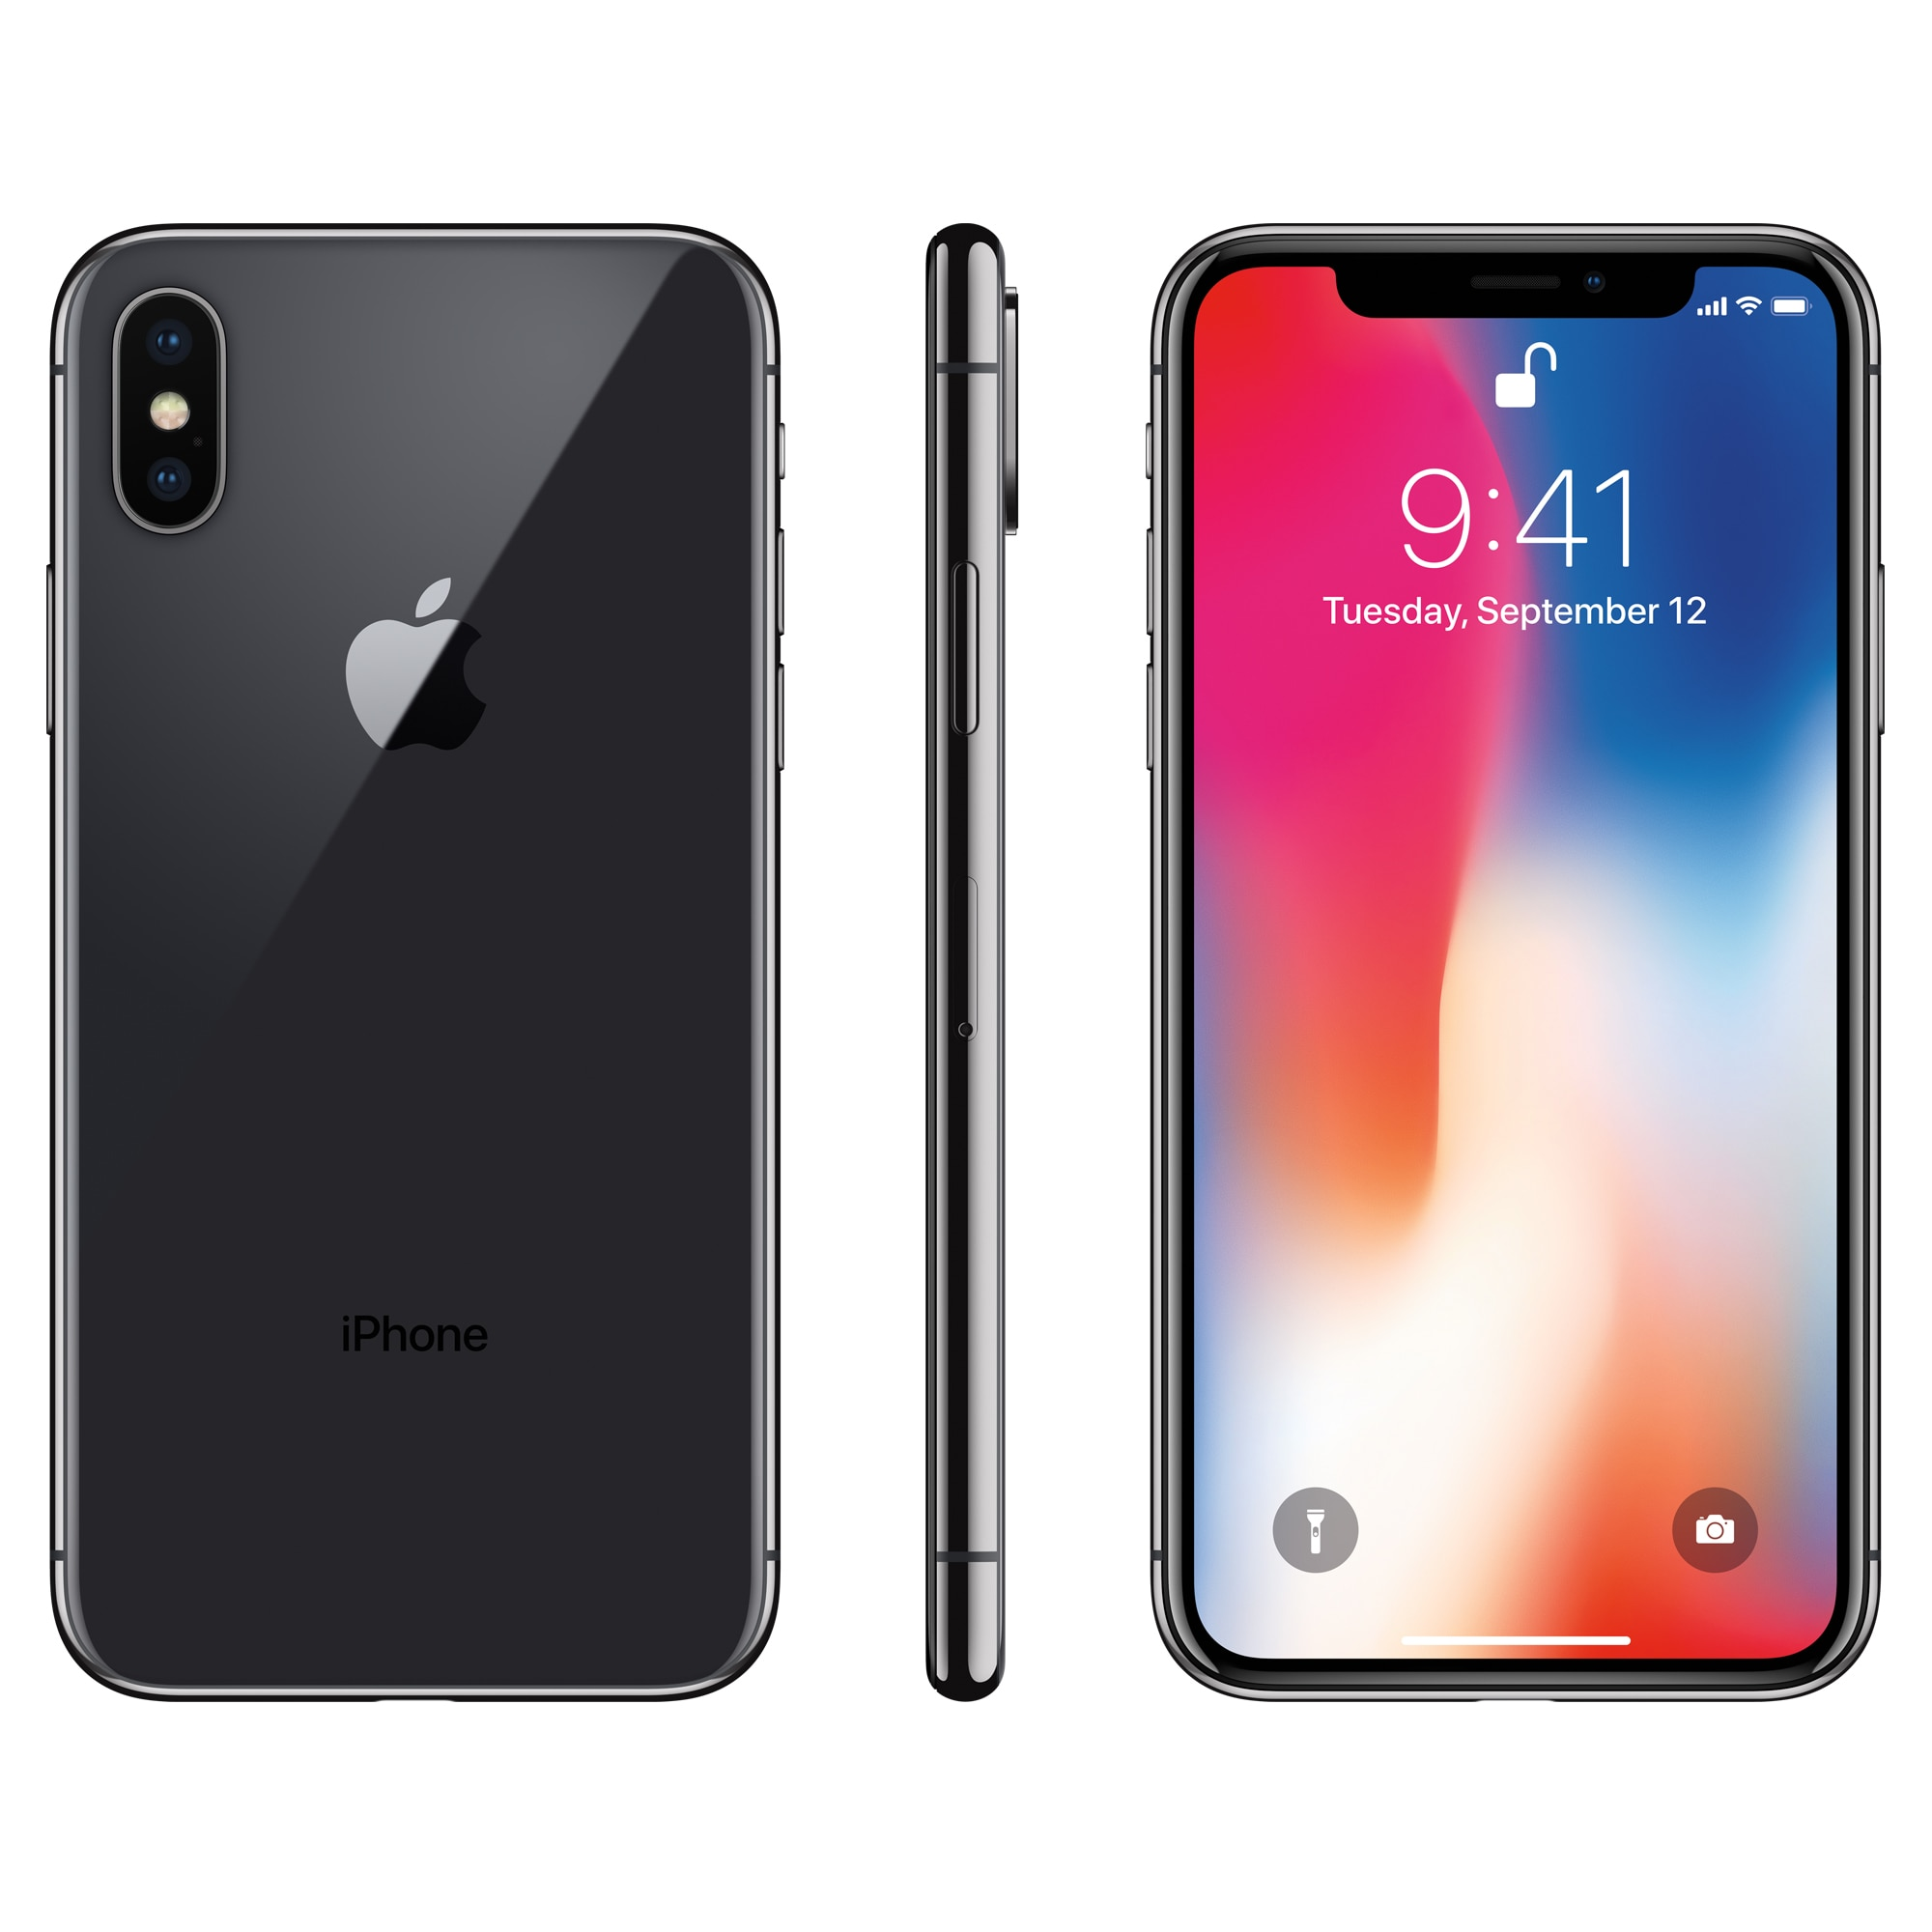 Смартфон iPhone X, разблокированный, 3+64/256 Гб, экран 5.8дюйм , камера 12 мп, функция Face ID, процессор Hexa Core, iOS A11, двойная камера